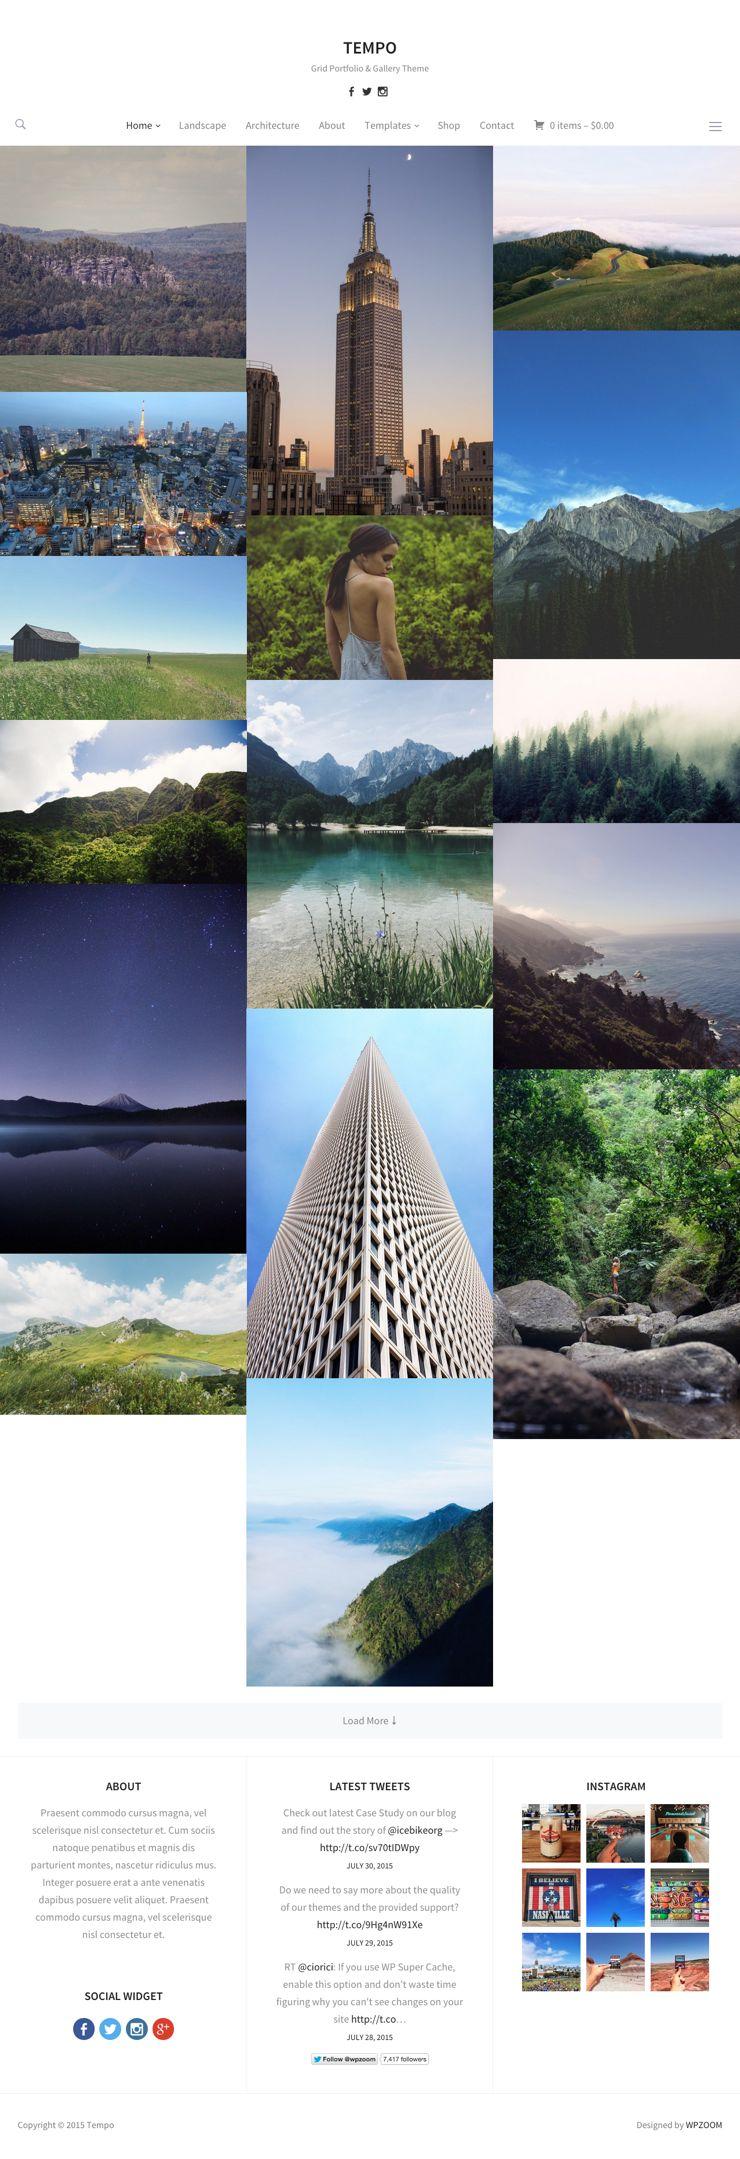 Tempo WordPress Grid Layout Photography Theme